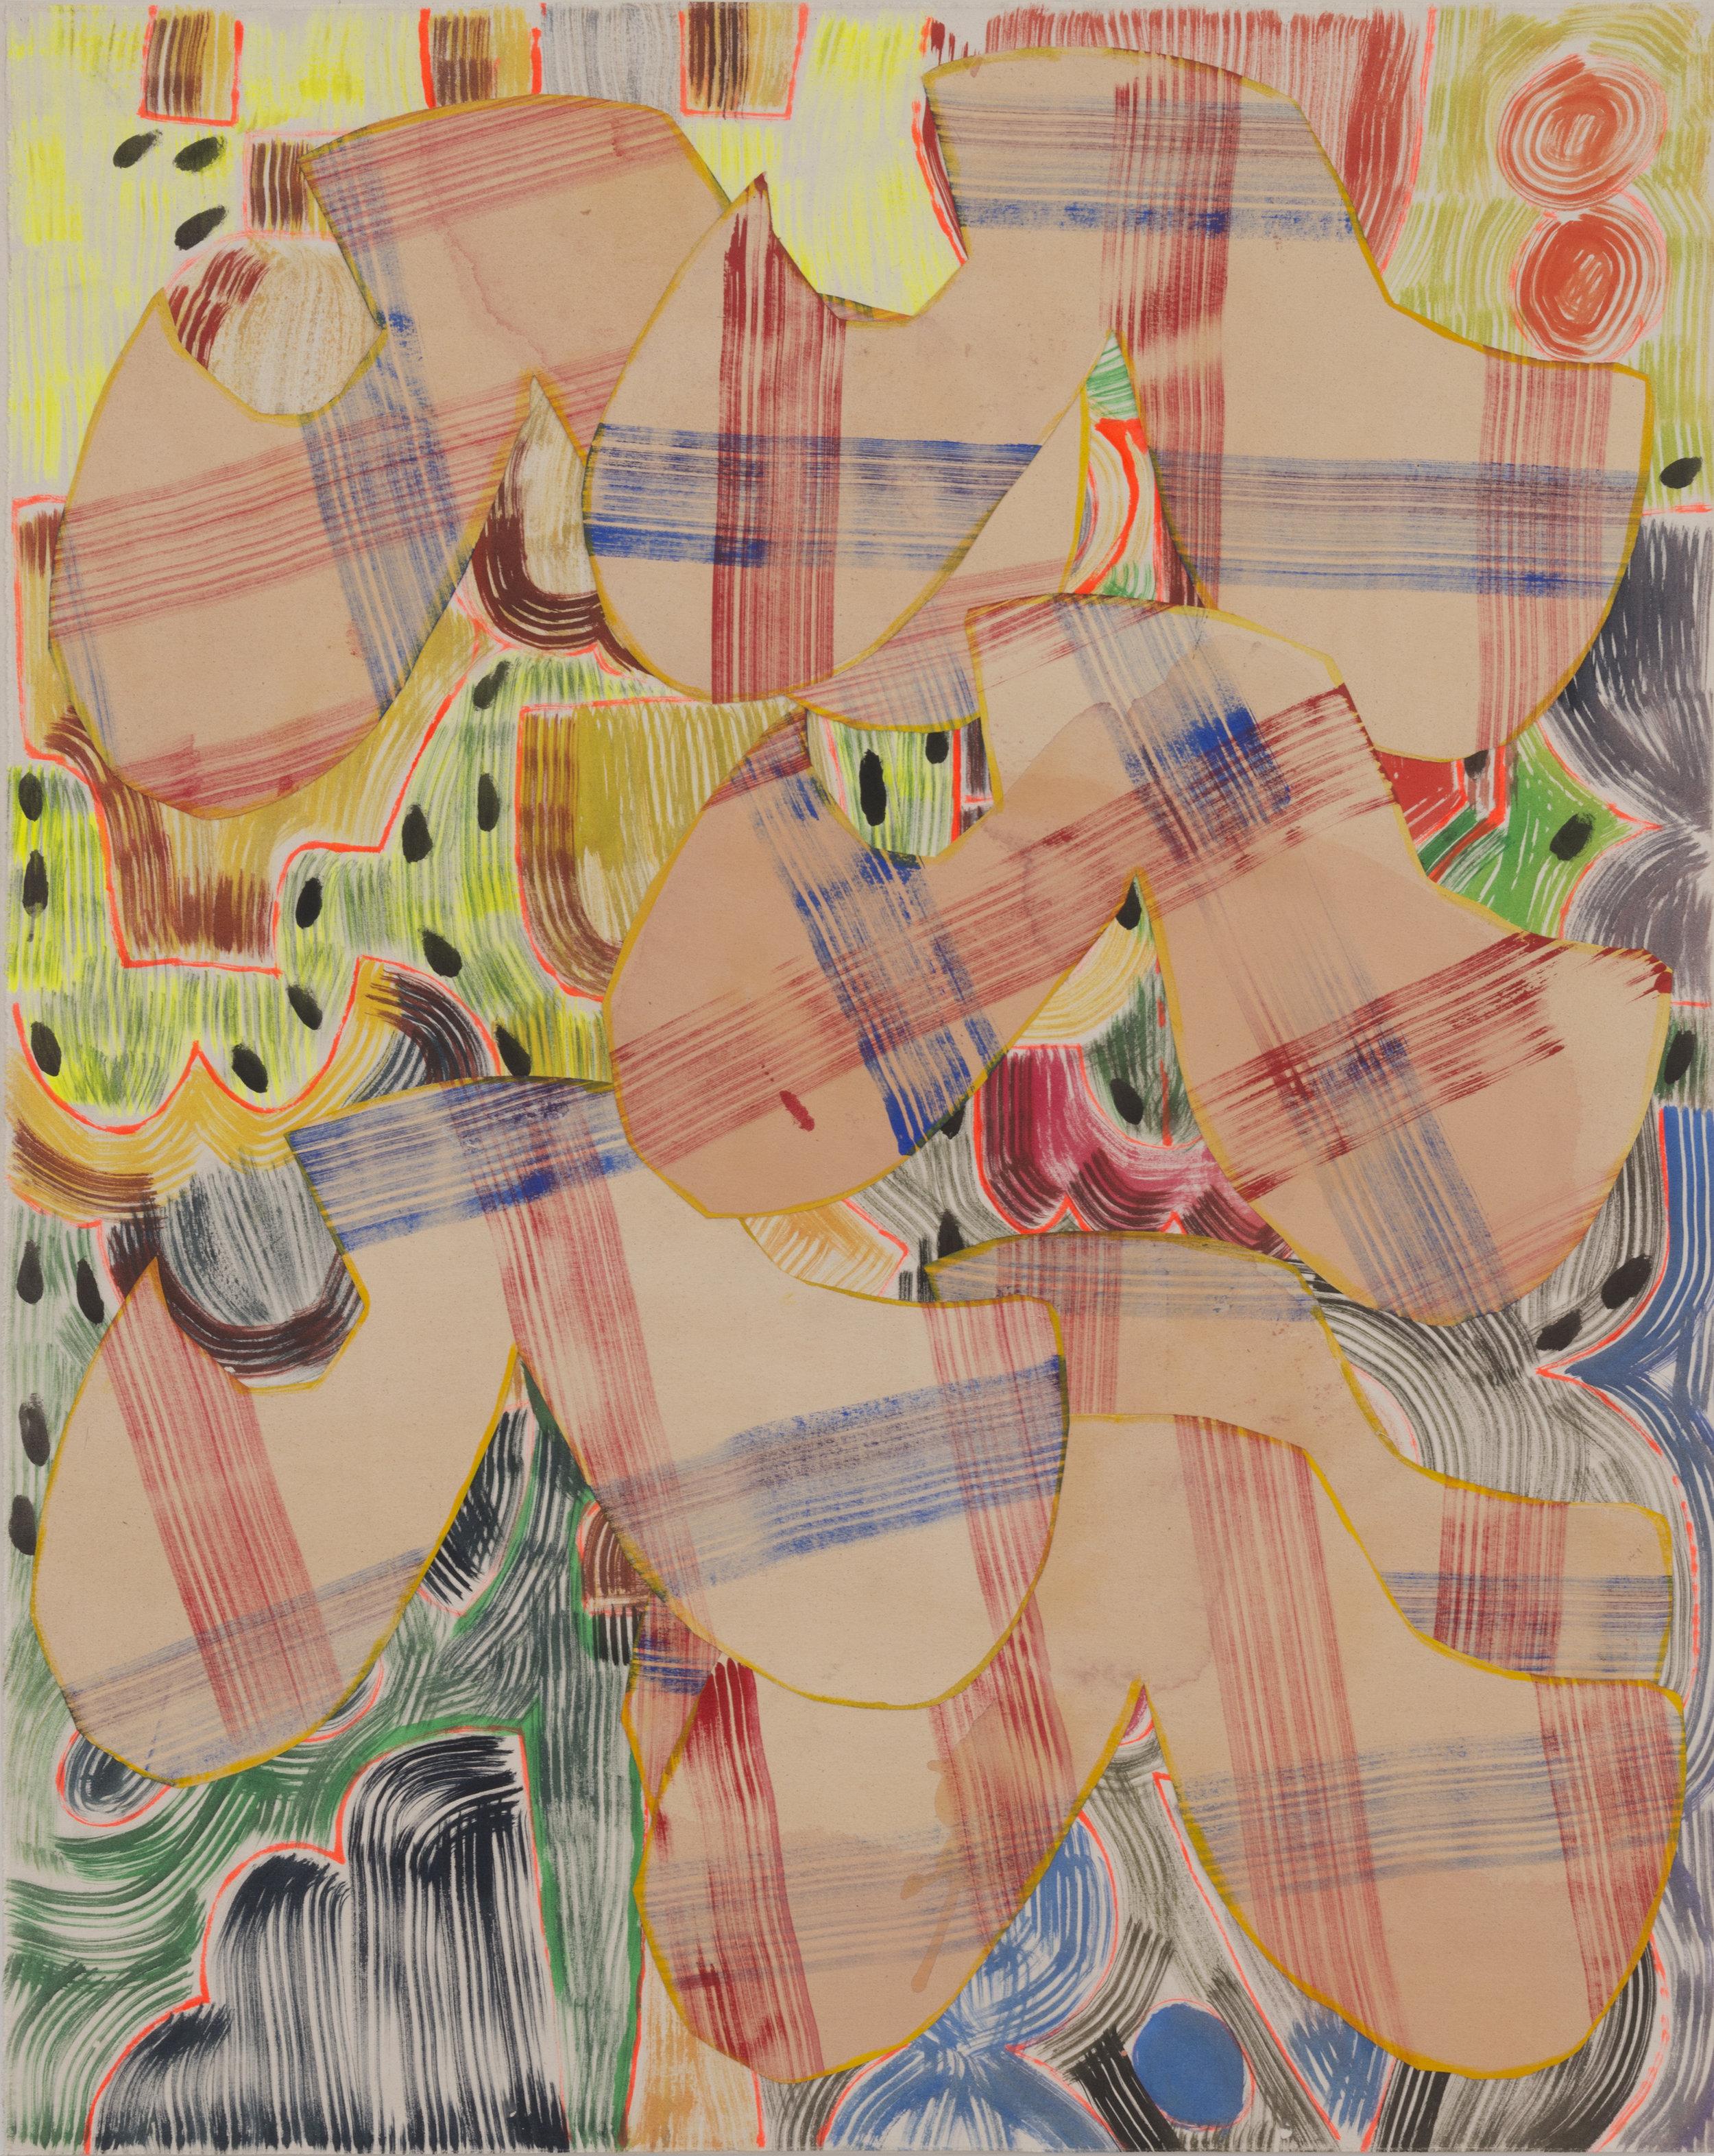 September 10, 2016 / Acrylic, Glue, Canvas / 71 1/4 x 57 1/2 inches